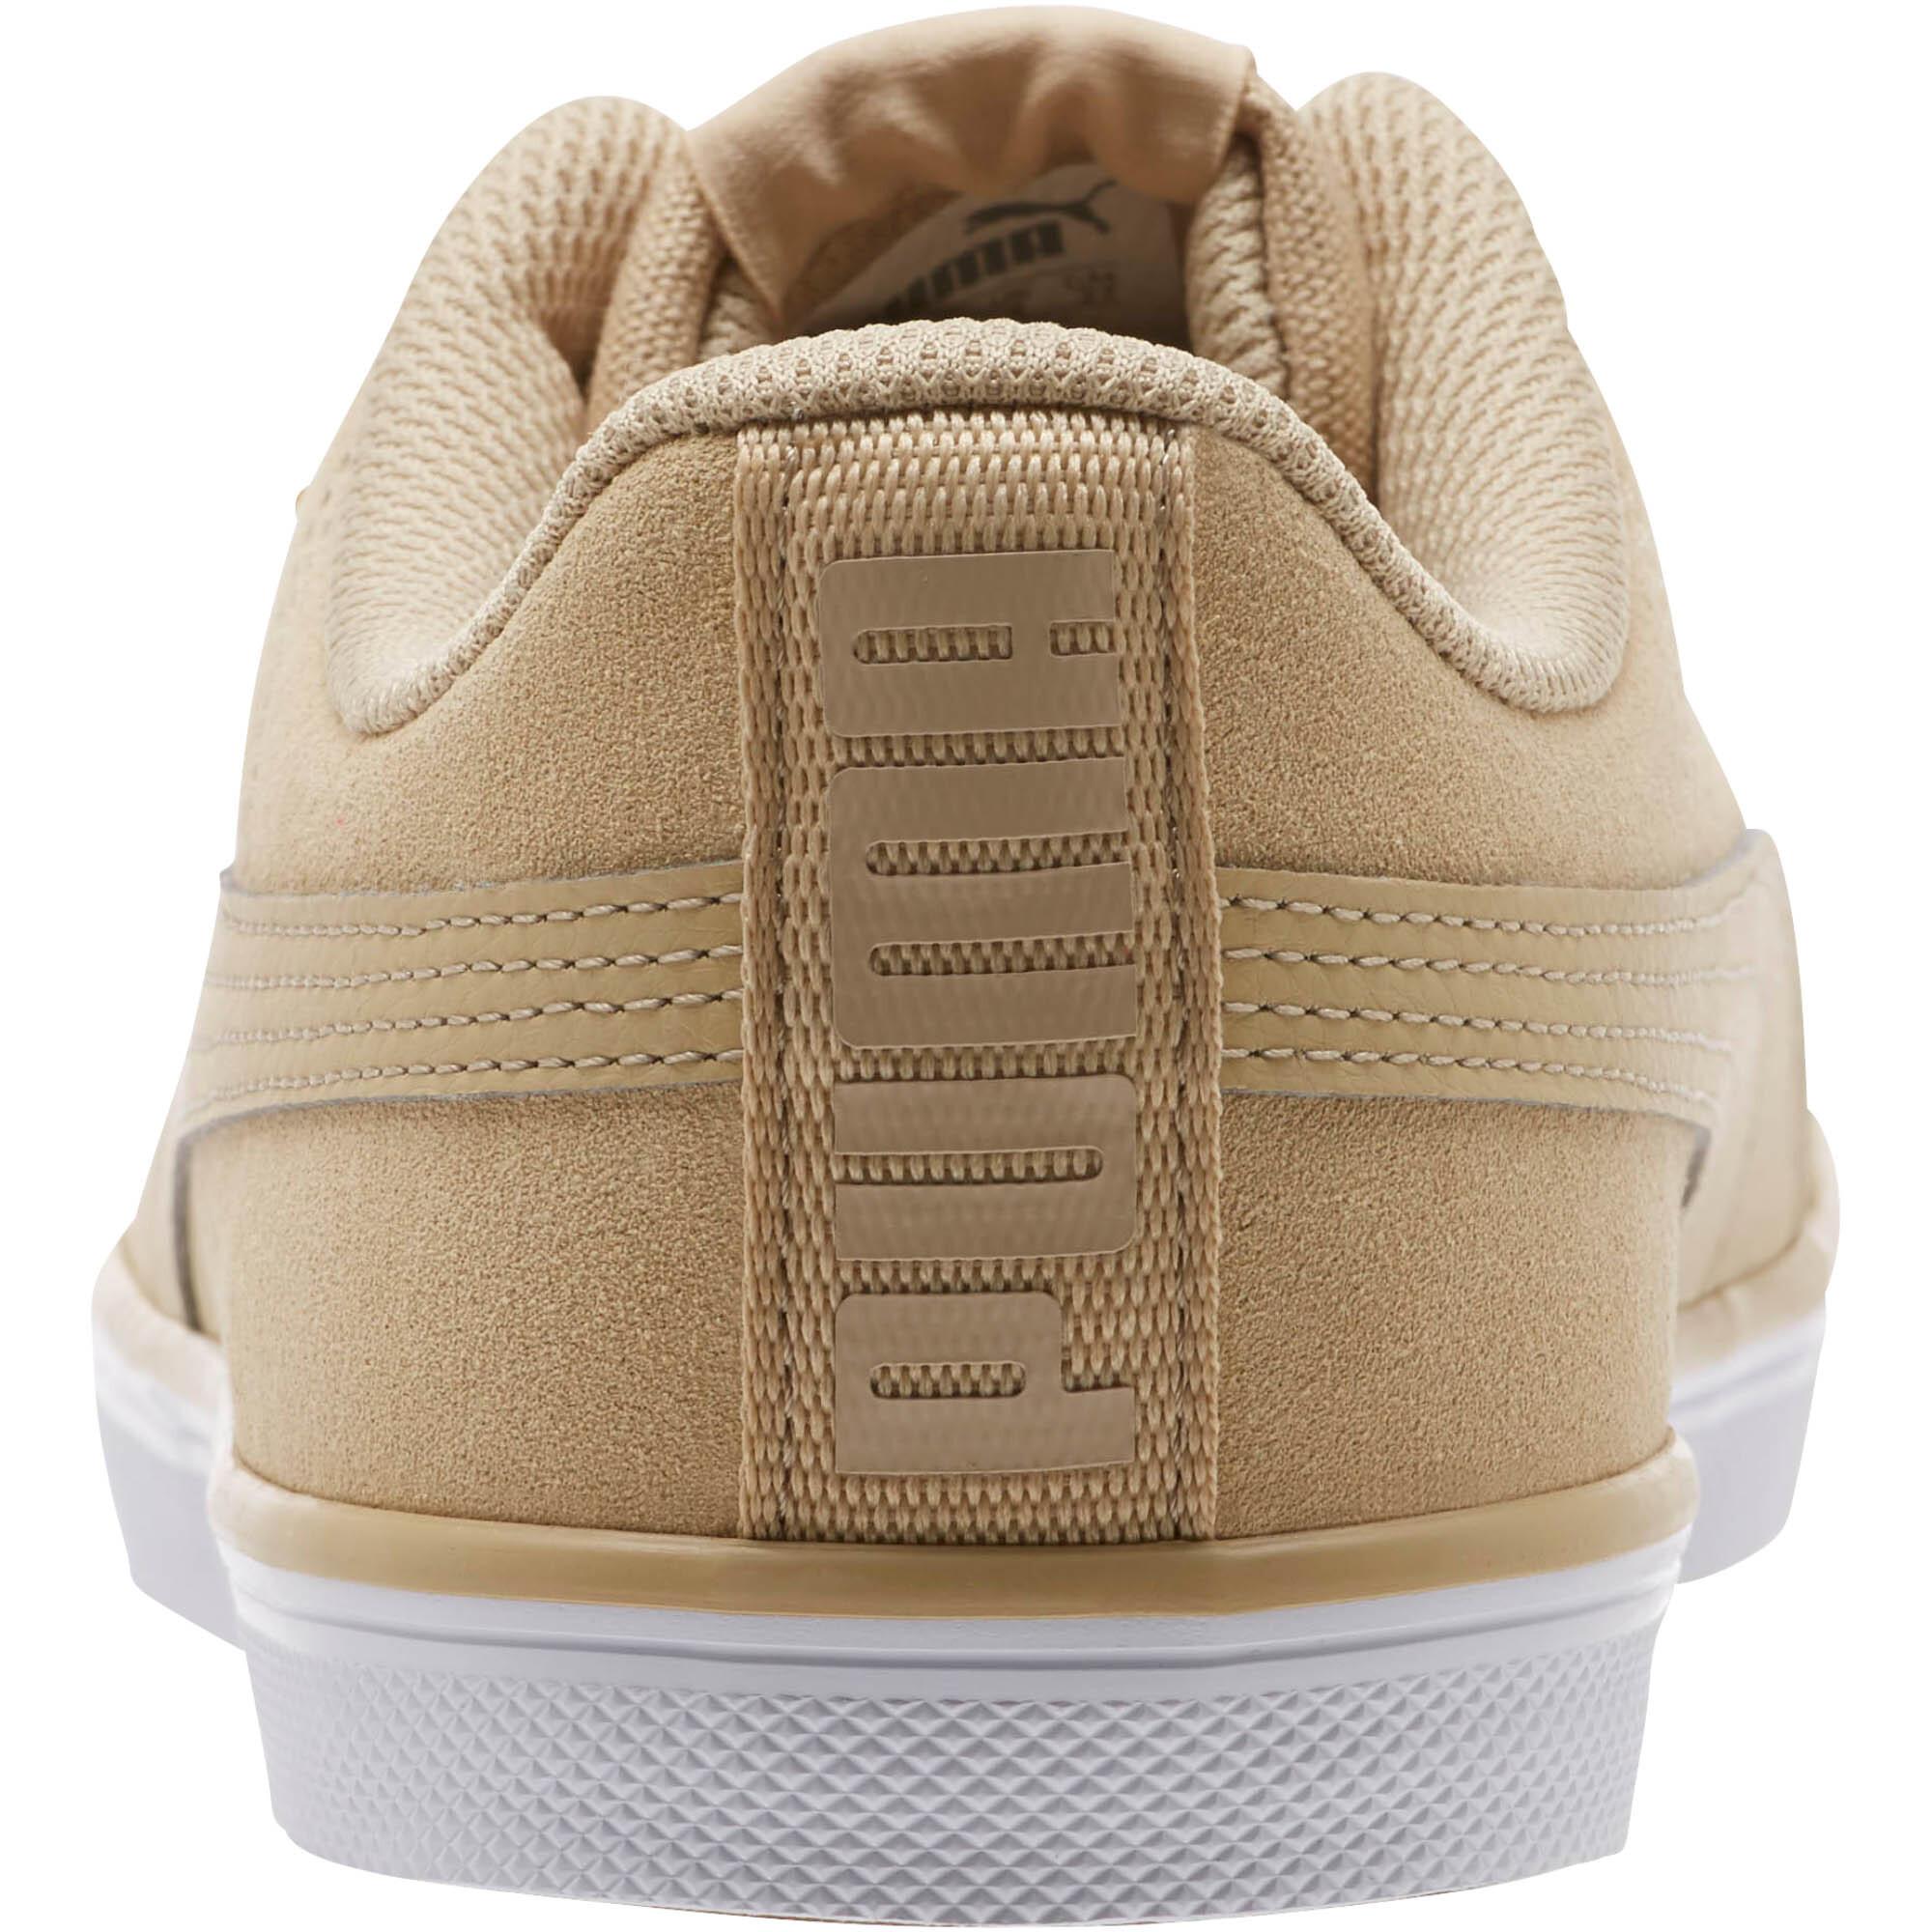 PUMA-Urban-Plus-Suede-Sneakers-Men-Shoe-Basics thumbnail 25